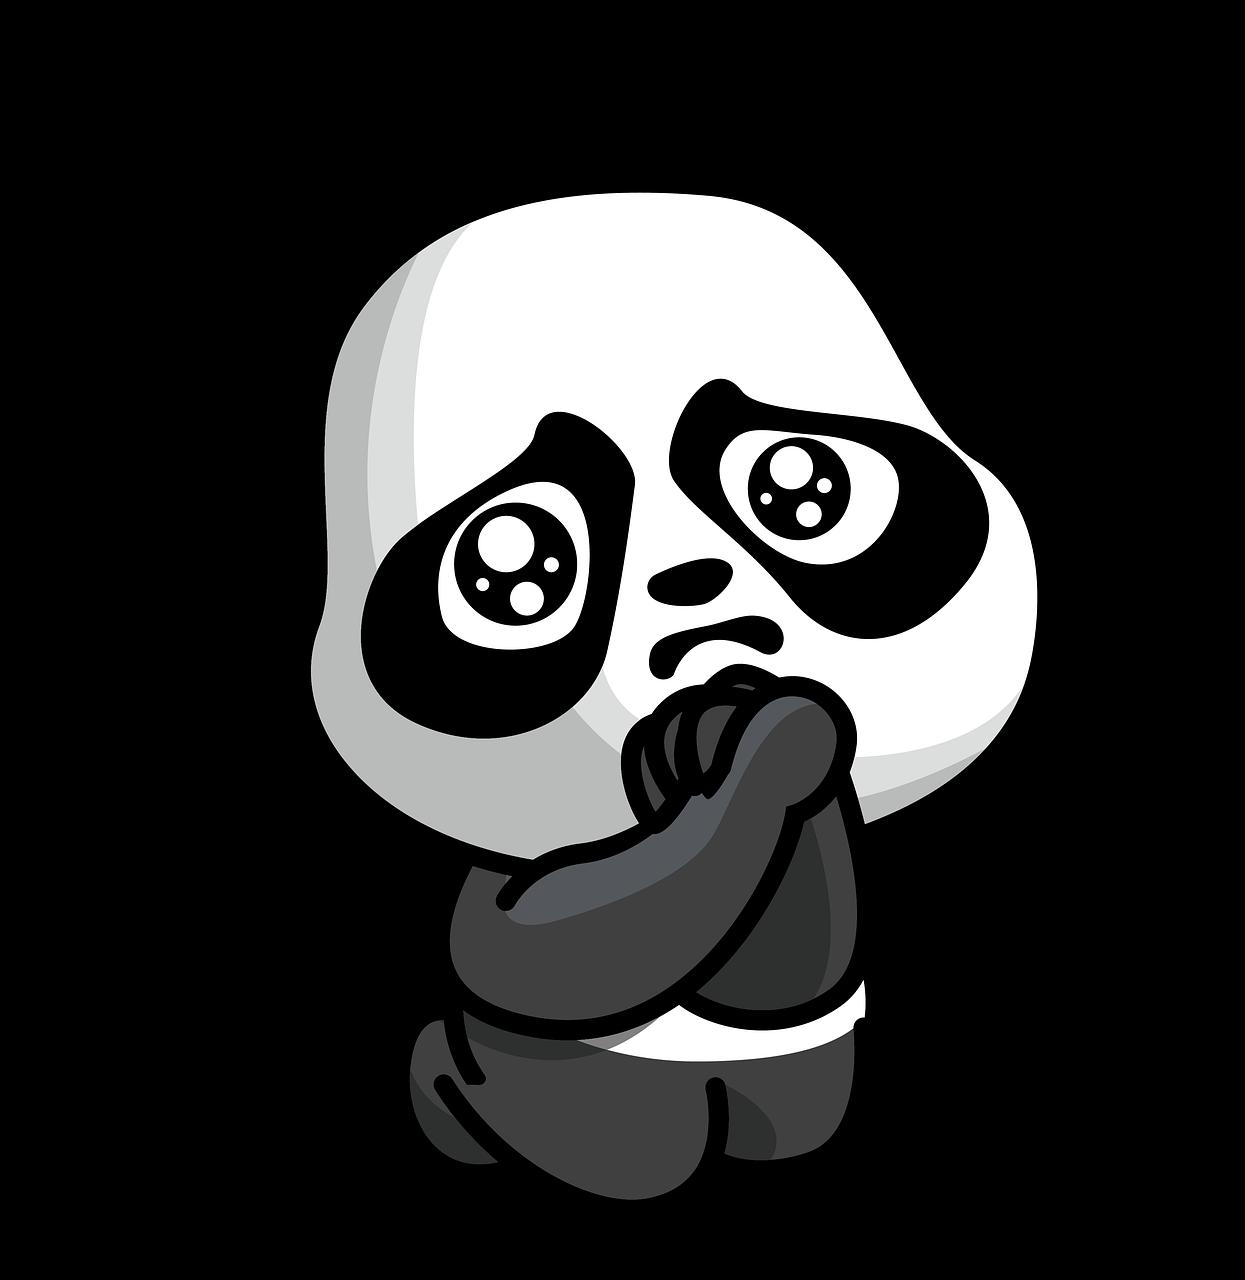 Panda Dessin Anime Mignon Image Gratuite Sur Pixabay